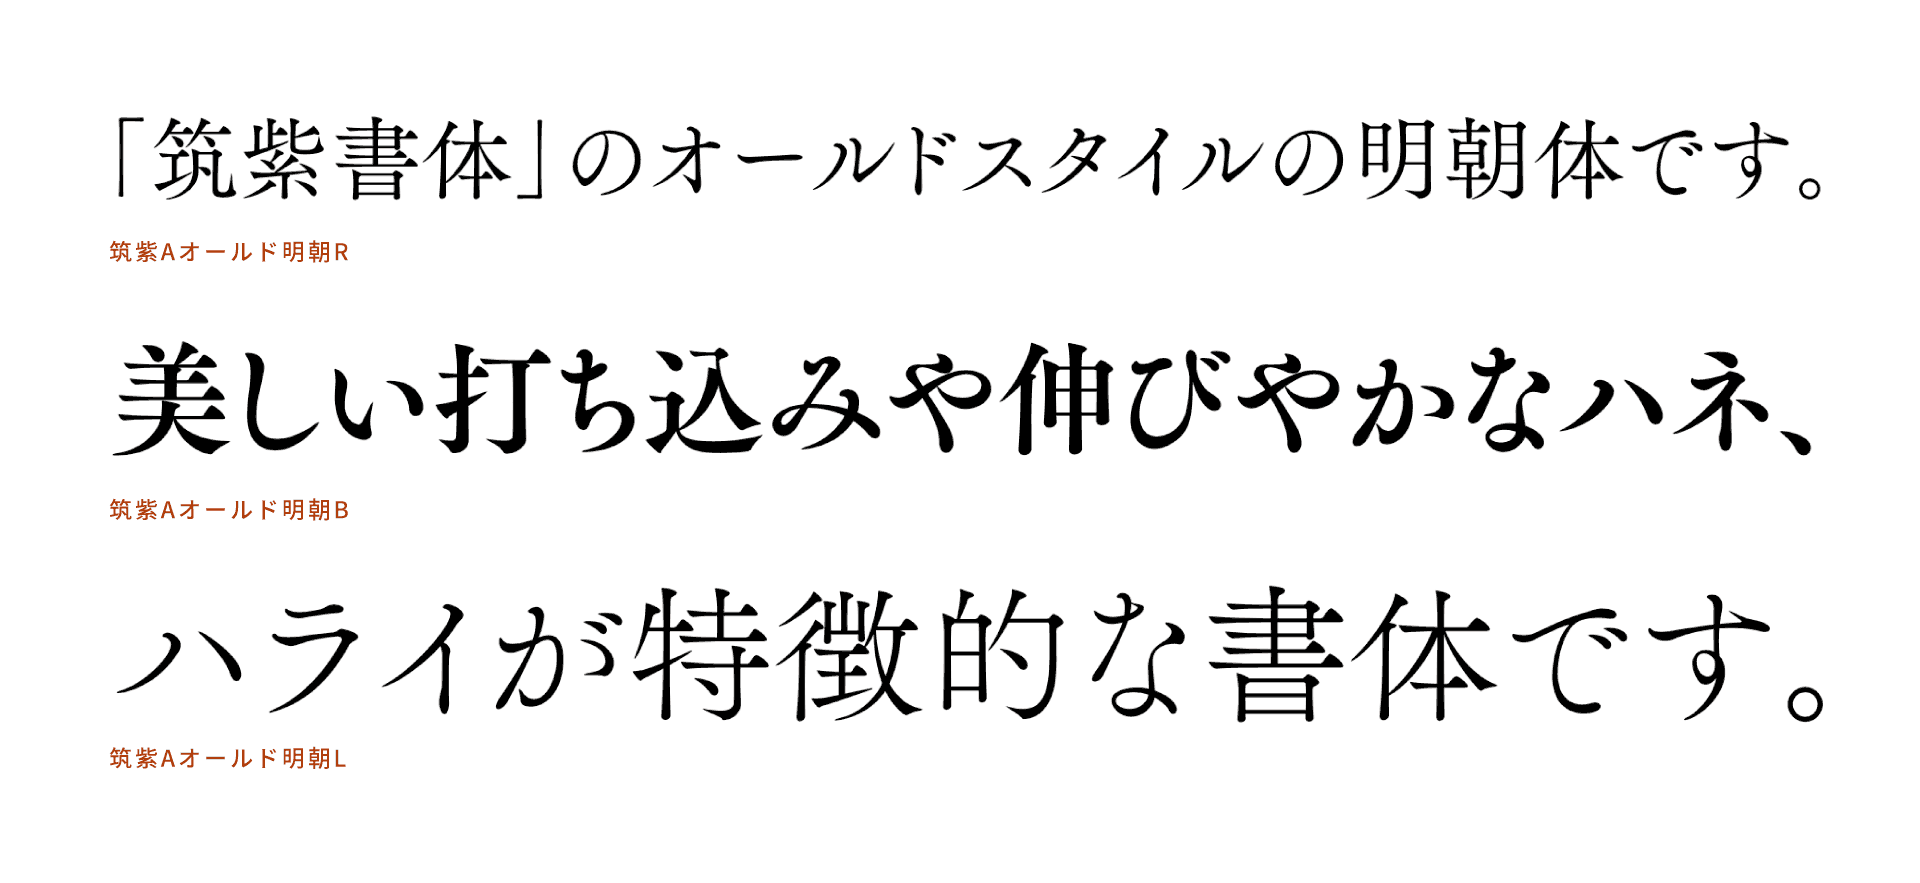 Tsukushi-Mincho